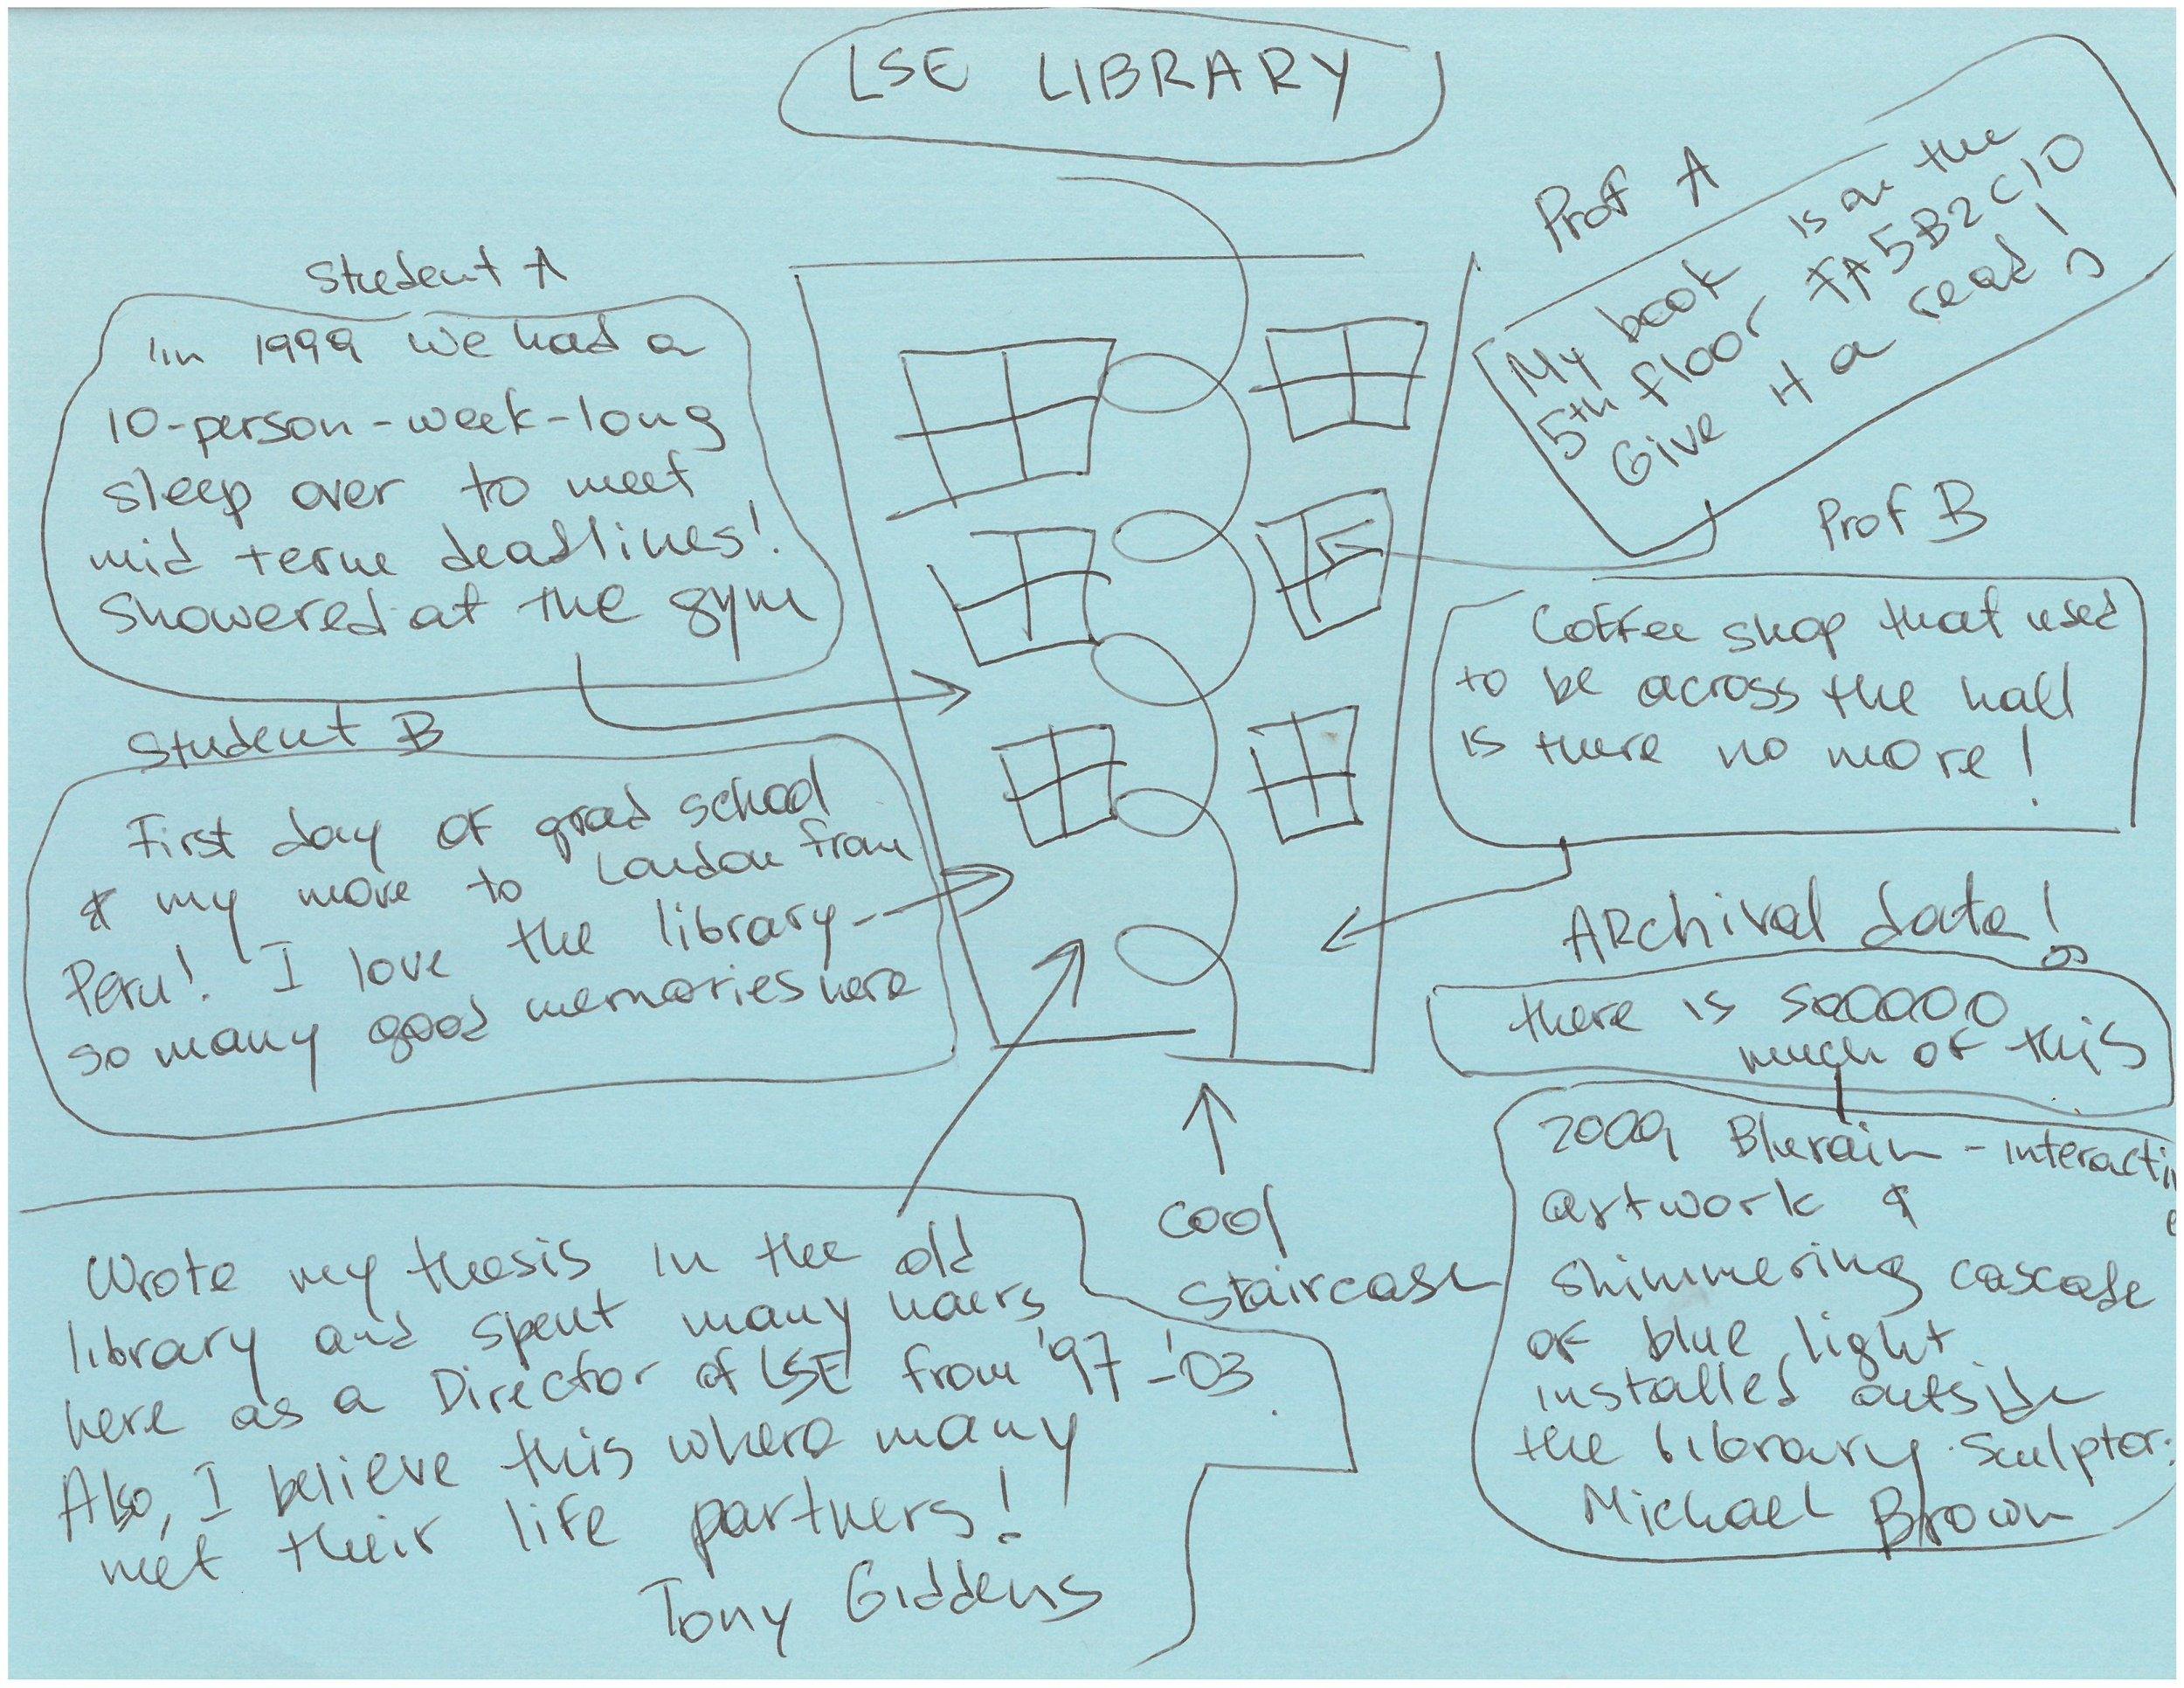 LSE_library.jpg